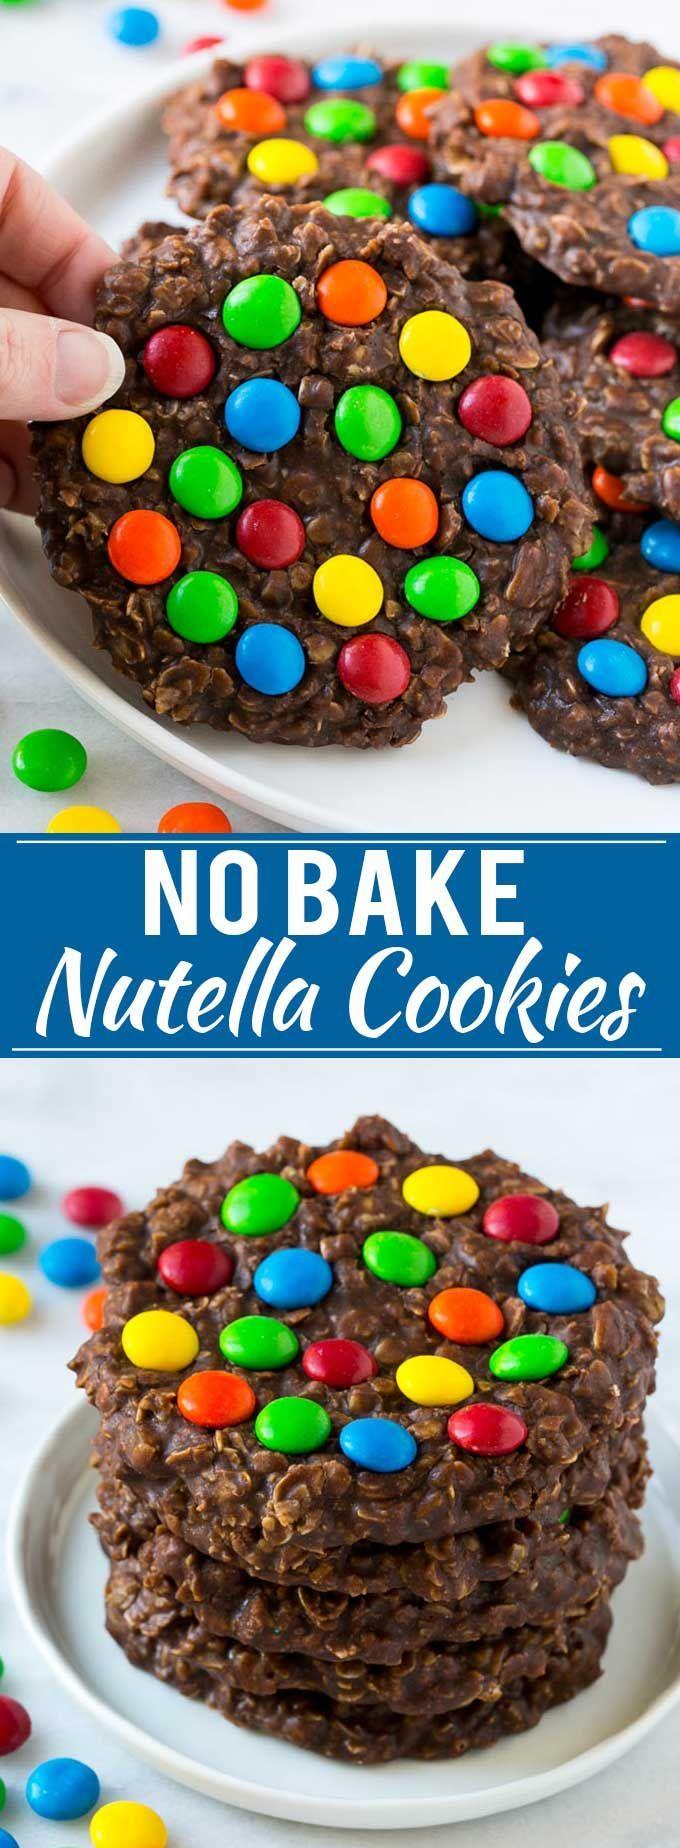 No Bake Nutella Cookies | No Bake Cookie Recipe | M&M's Cookies | Chocolate Oatmeal Cookies